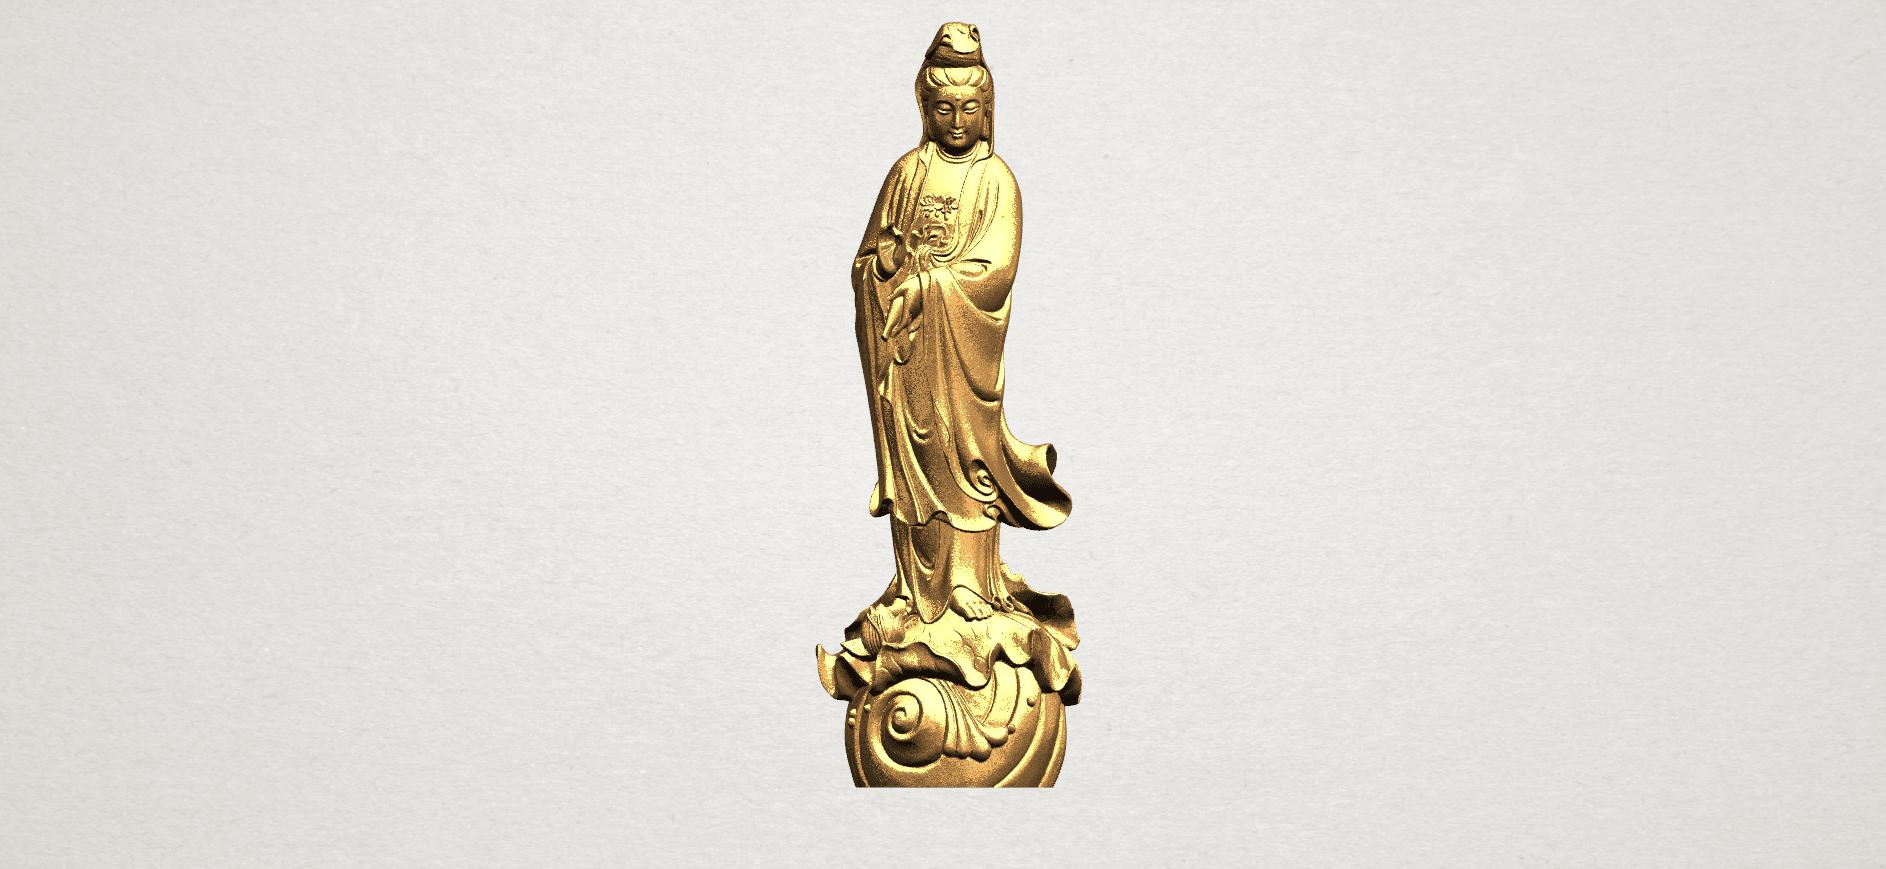 Avalokitesvara Buddha - Standing (i) A01.png Télécharger fichier STL gratuit Avalokitesvara Bodhisattva - Debout 01 • Design à imprimer en 3D, GeorgesNikkei